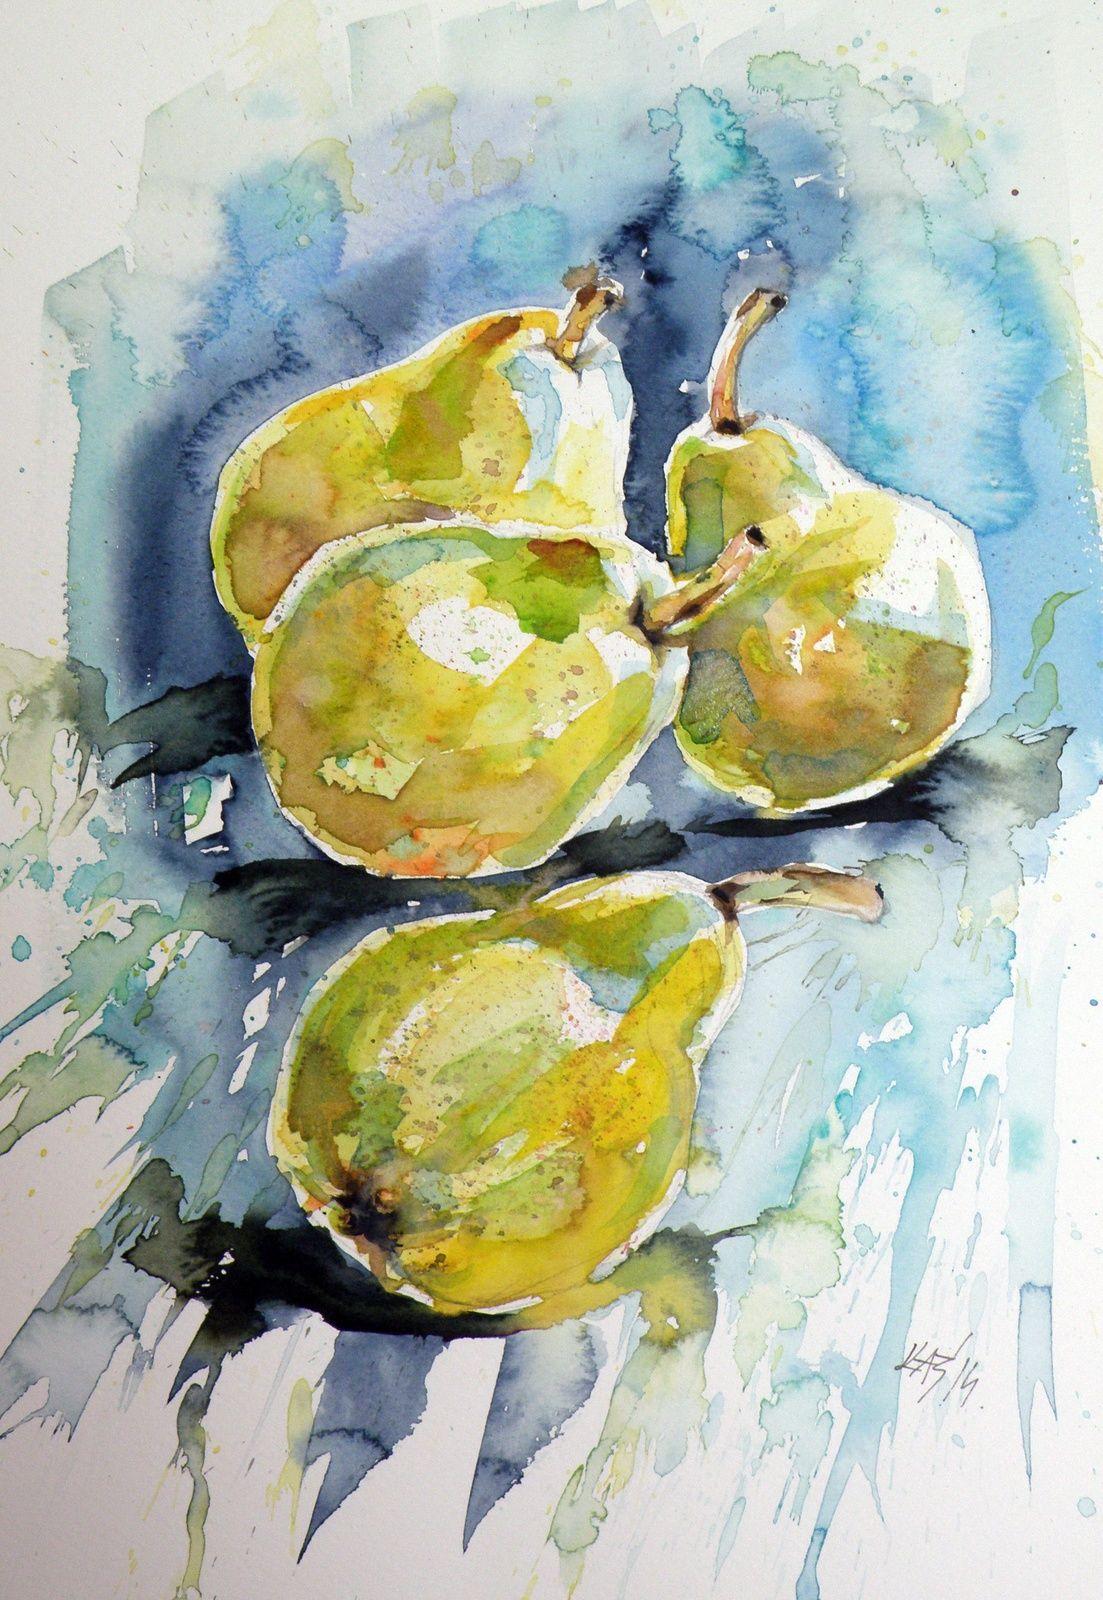 Pears Painting By Kovacs Anna Brigitta Artfinder Painting